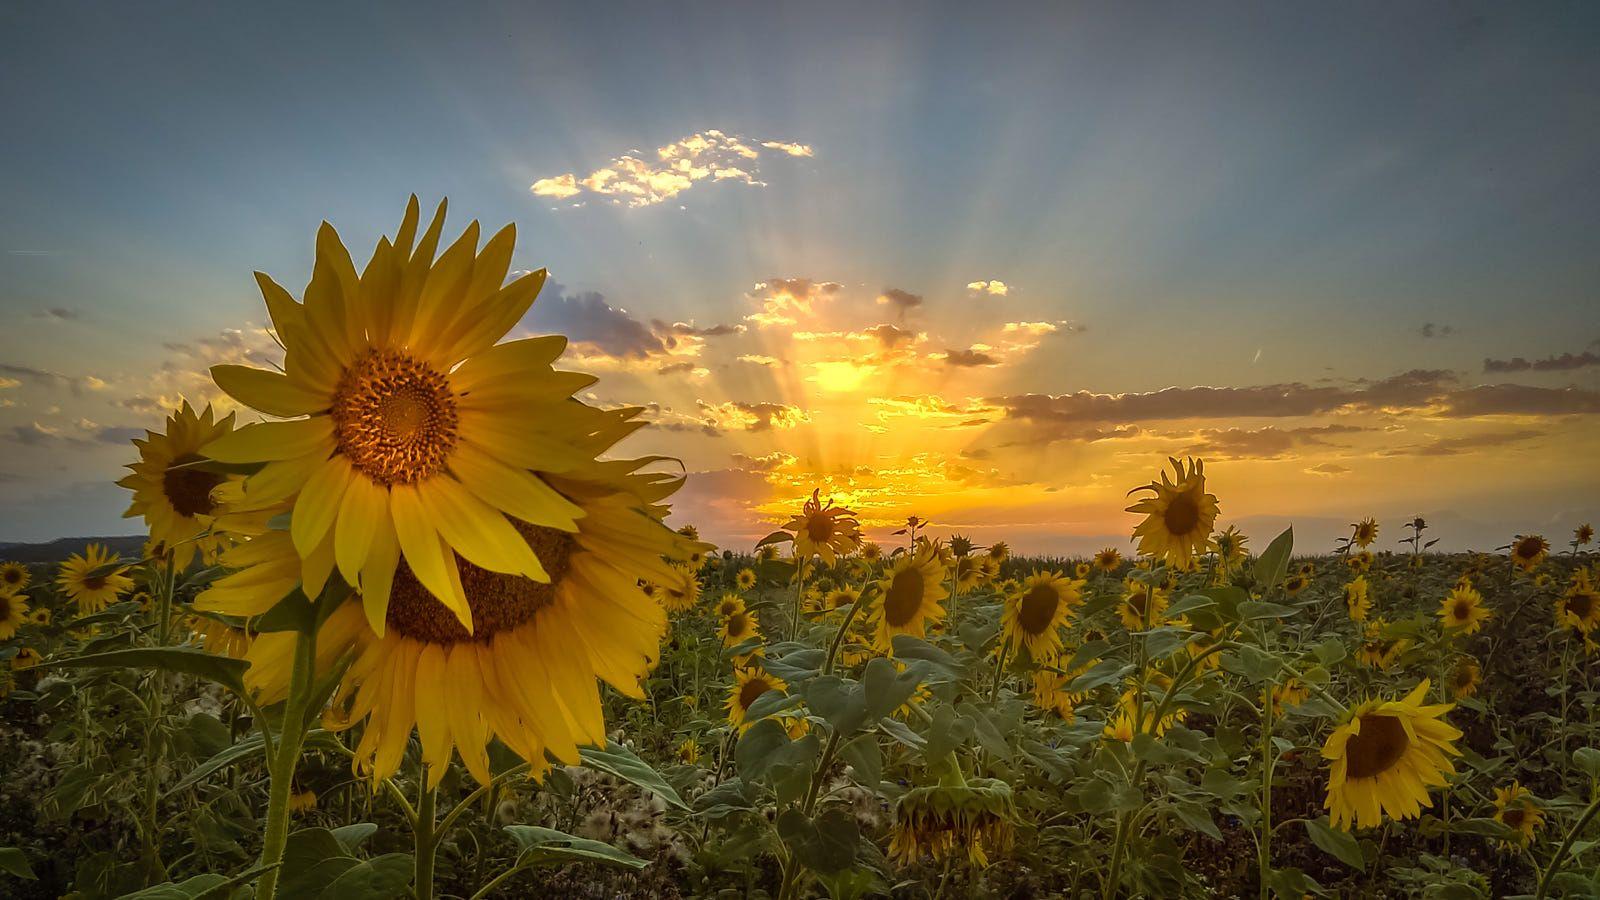 Sunfields Garden By Ralf Thomas On 500px Garden Cool